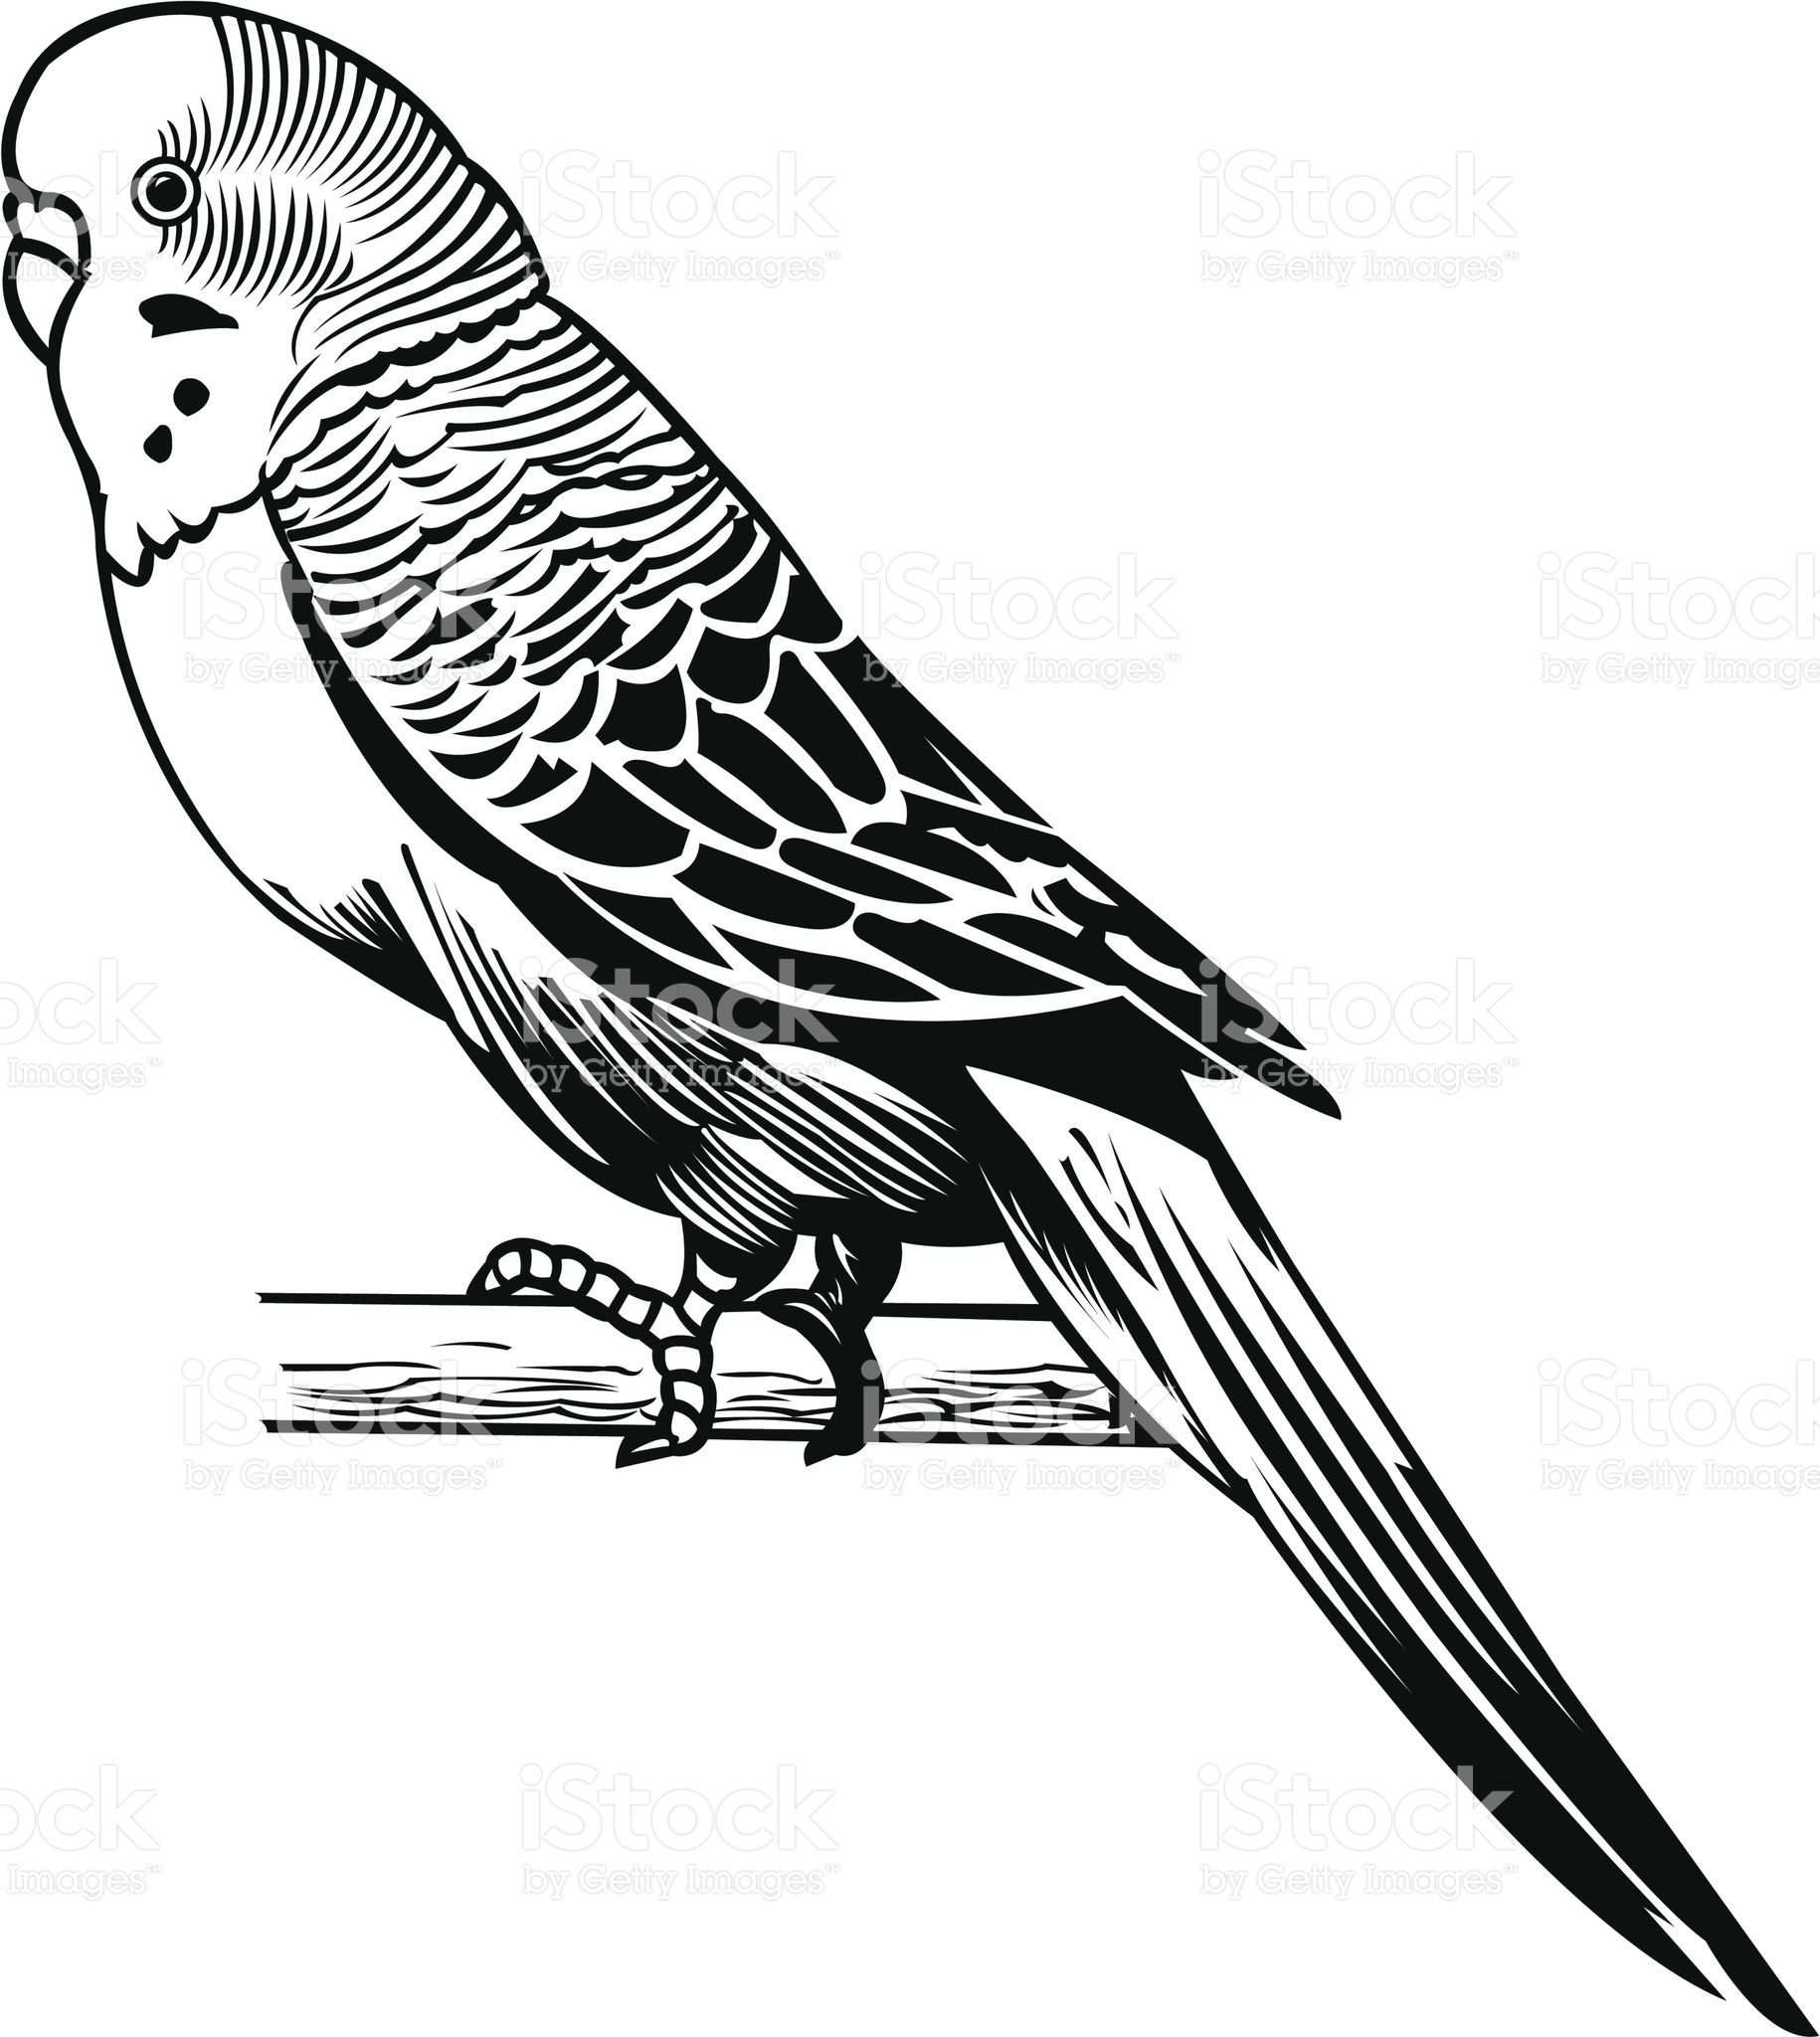 Parakeet Domestic Bird Graphic Vector Illustration Of A